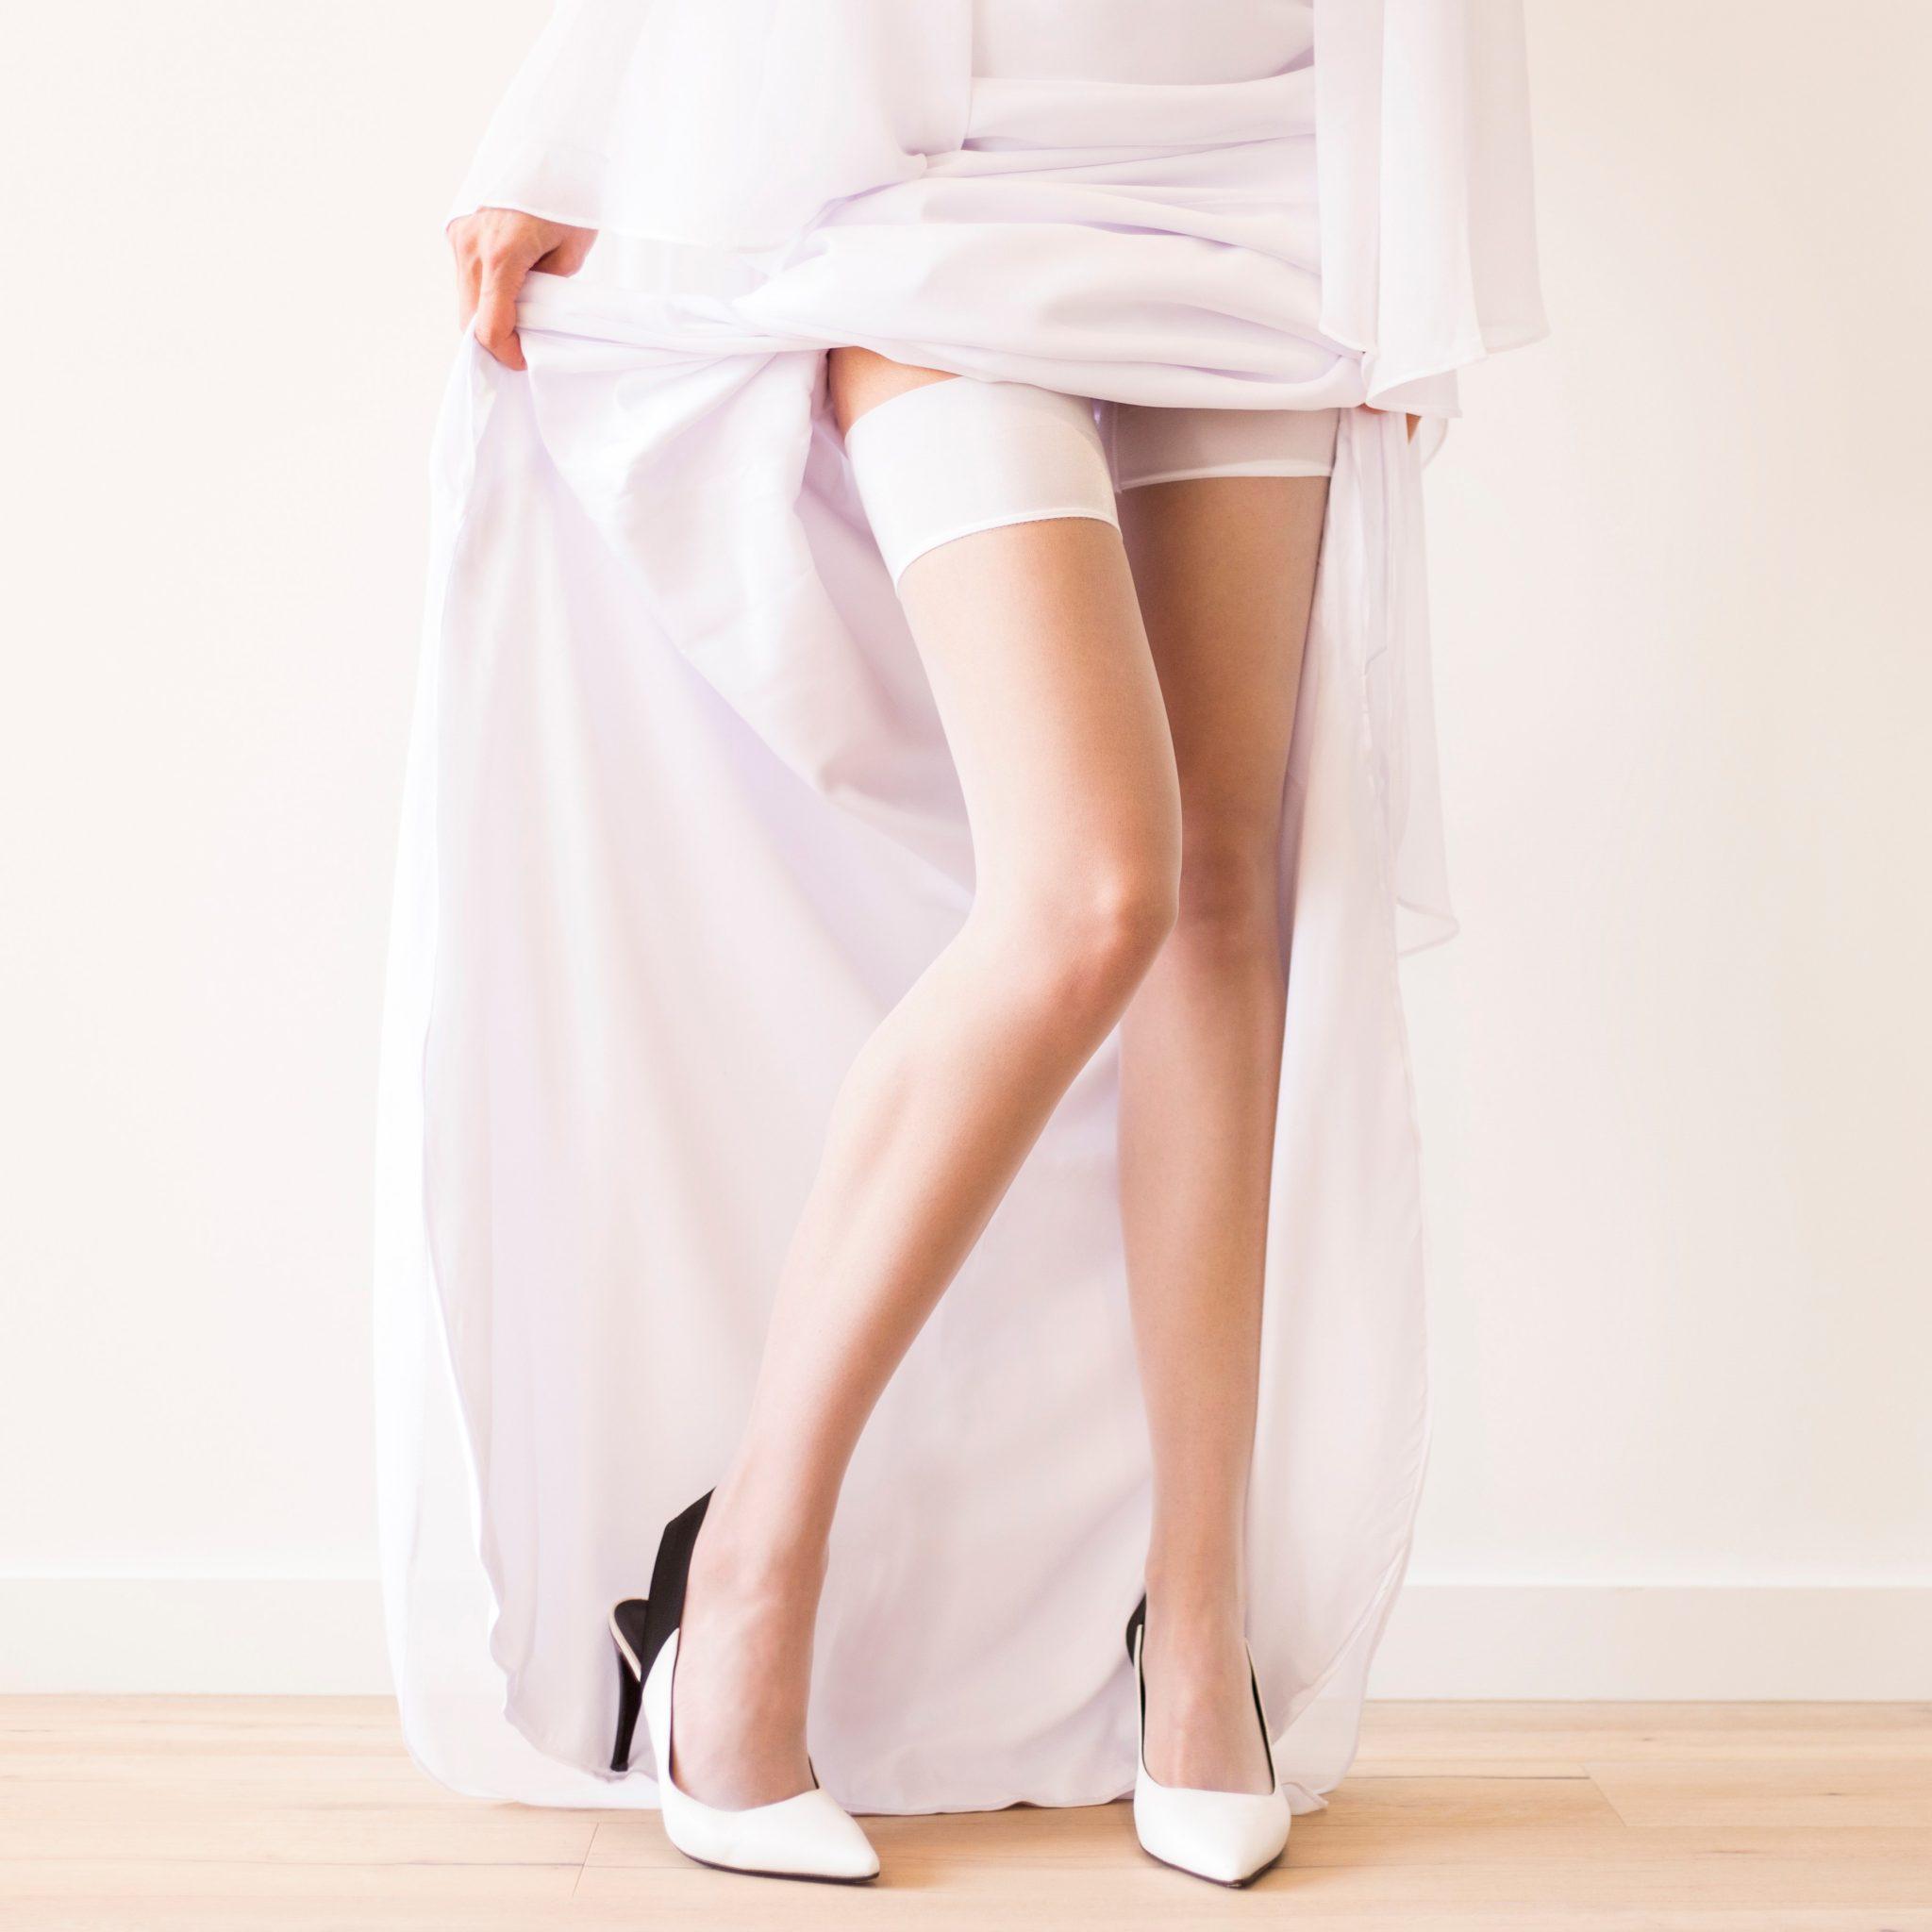 Wedding white stockings for the bride